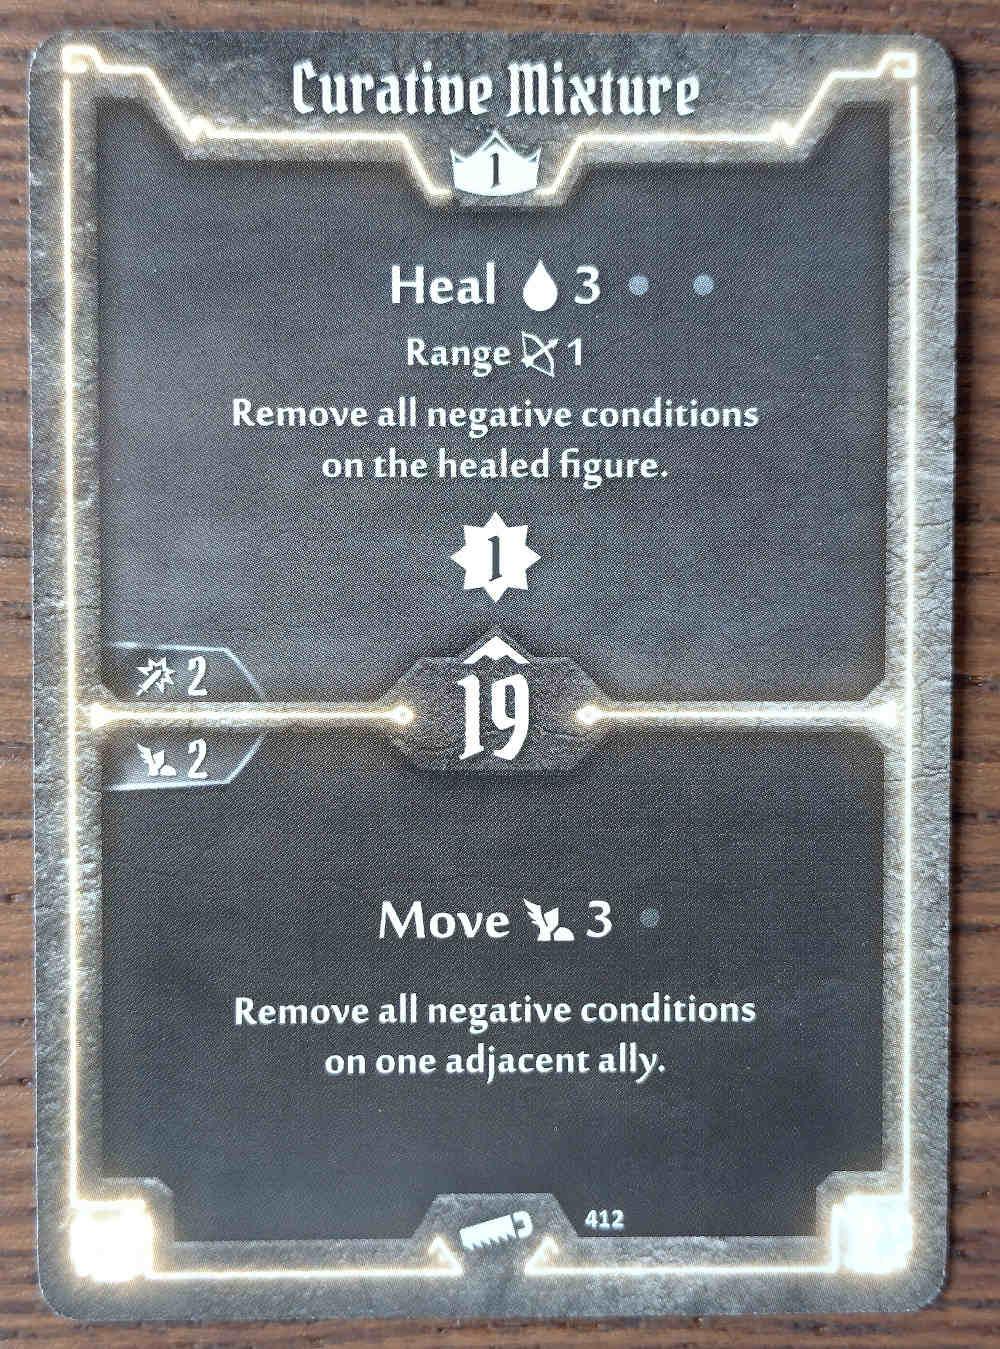 Level 1 Sawbones card Curative Mixture